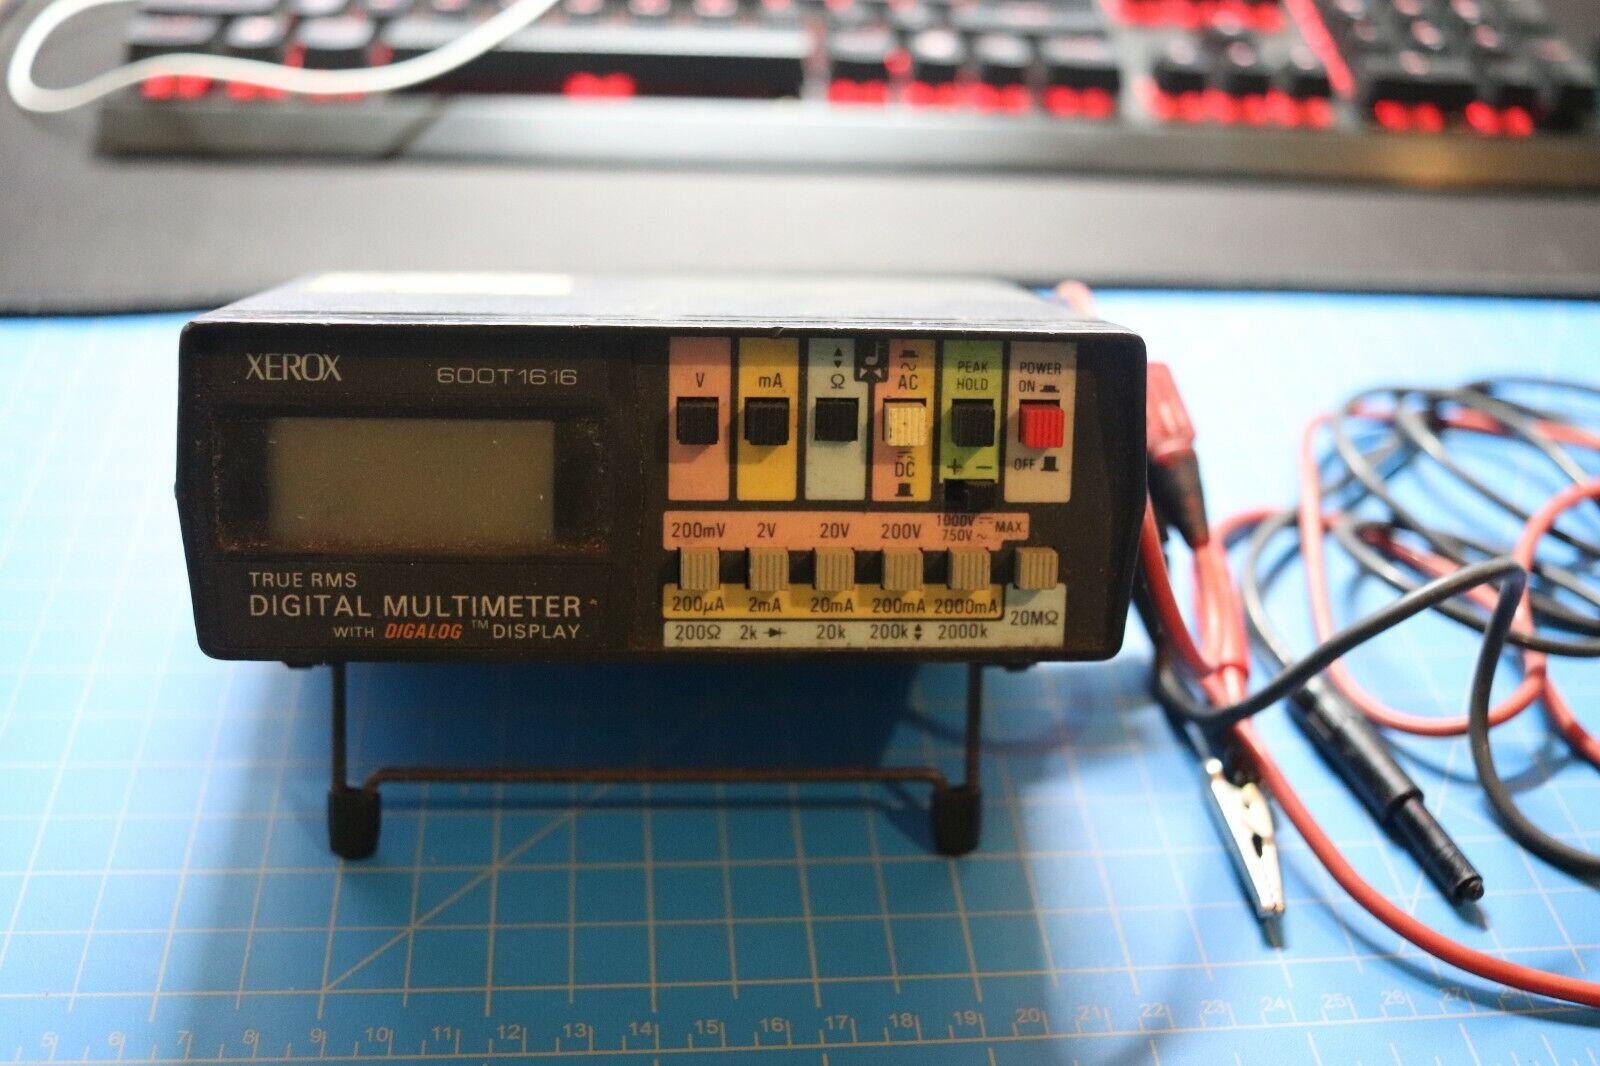 XEROX 600T1616 TRUE RMS DIGITAL MULTIMETER - $59.99